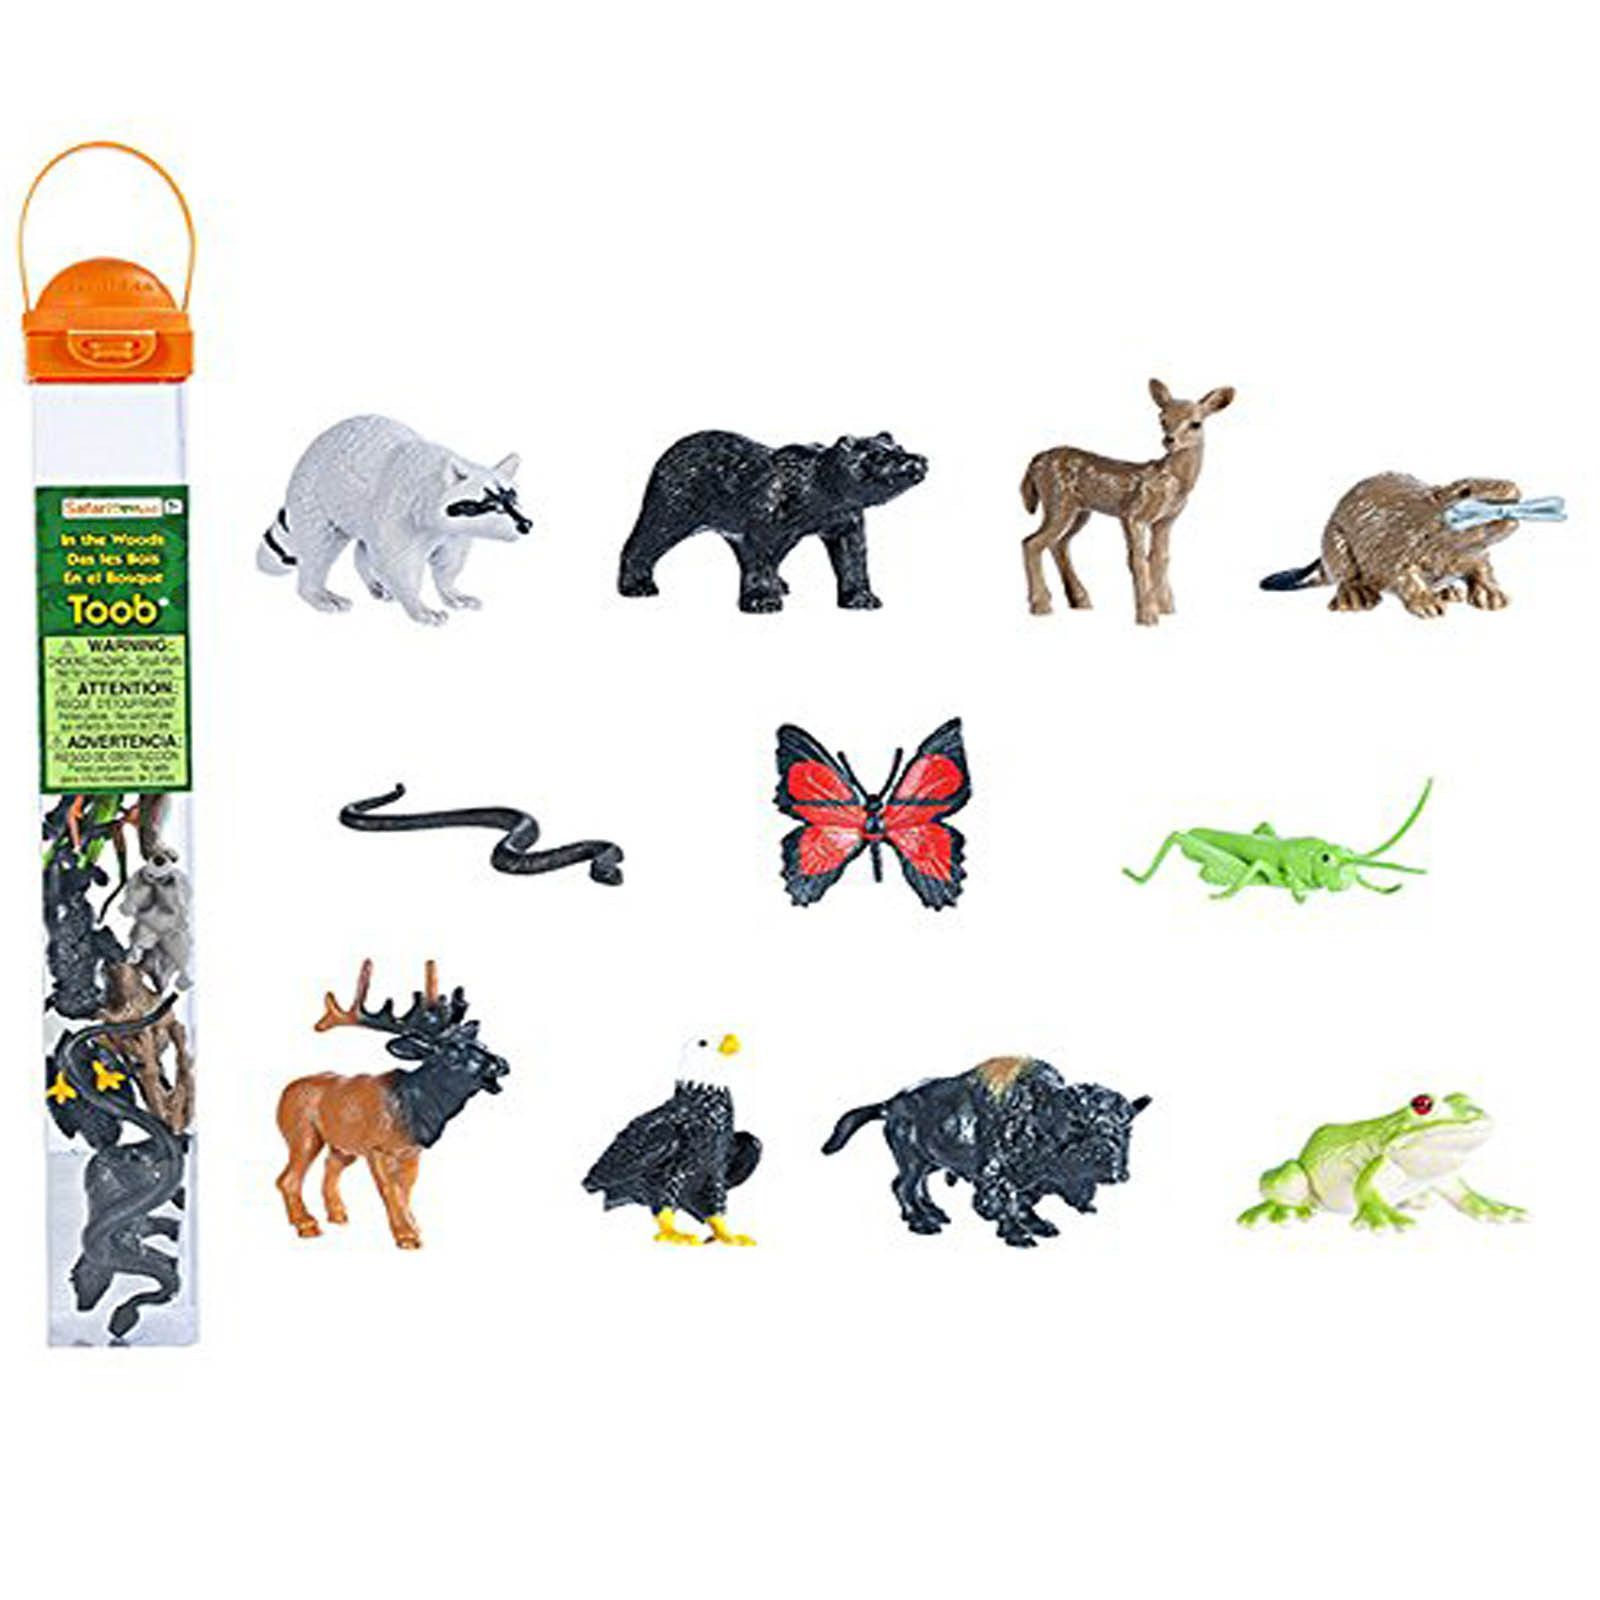 In The Woods Toob Mini Figures Safari Ltd Safari